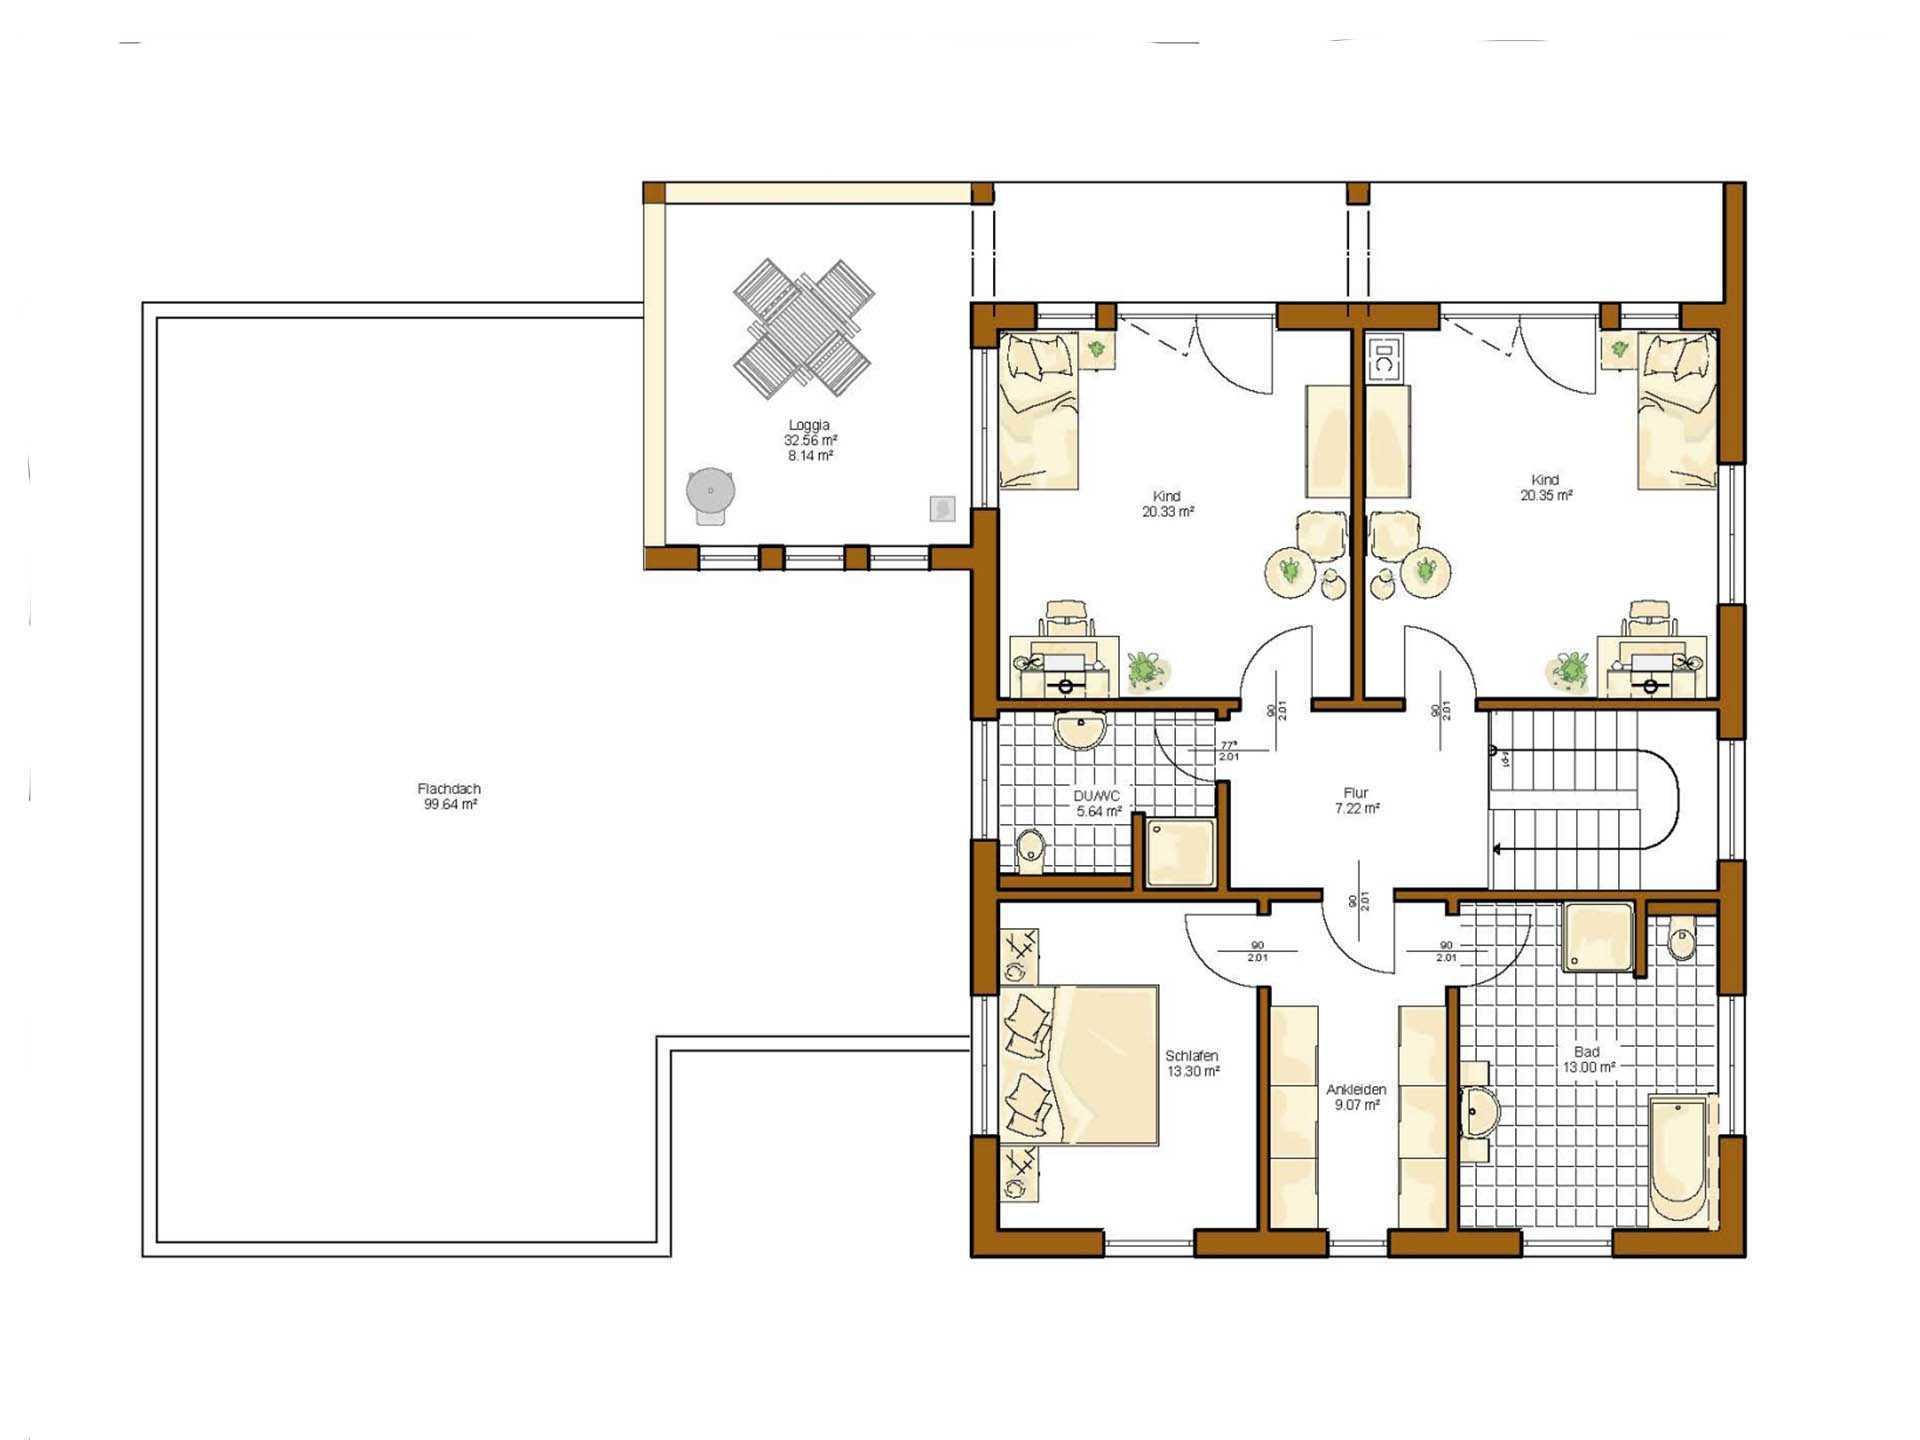 haus twinline r genua rensch haus. Black Bedroom Furniture Sets. Home Design Ideas